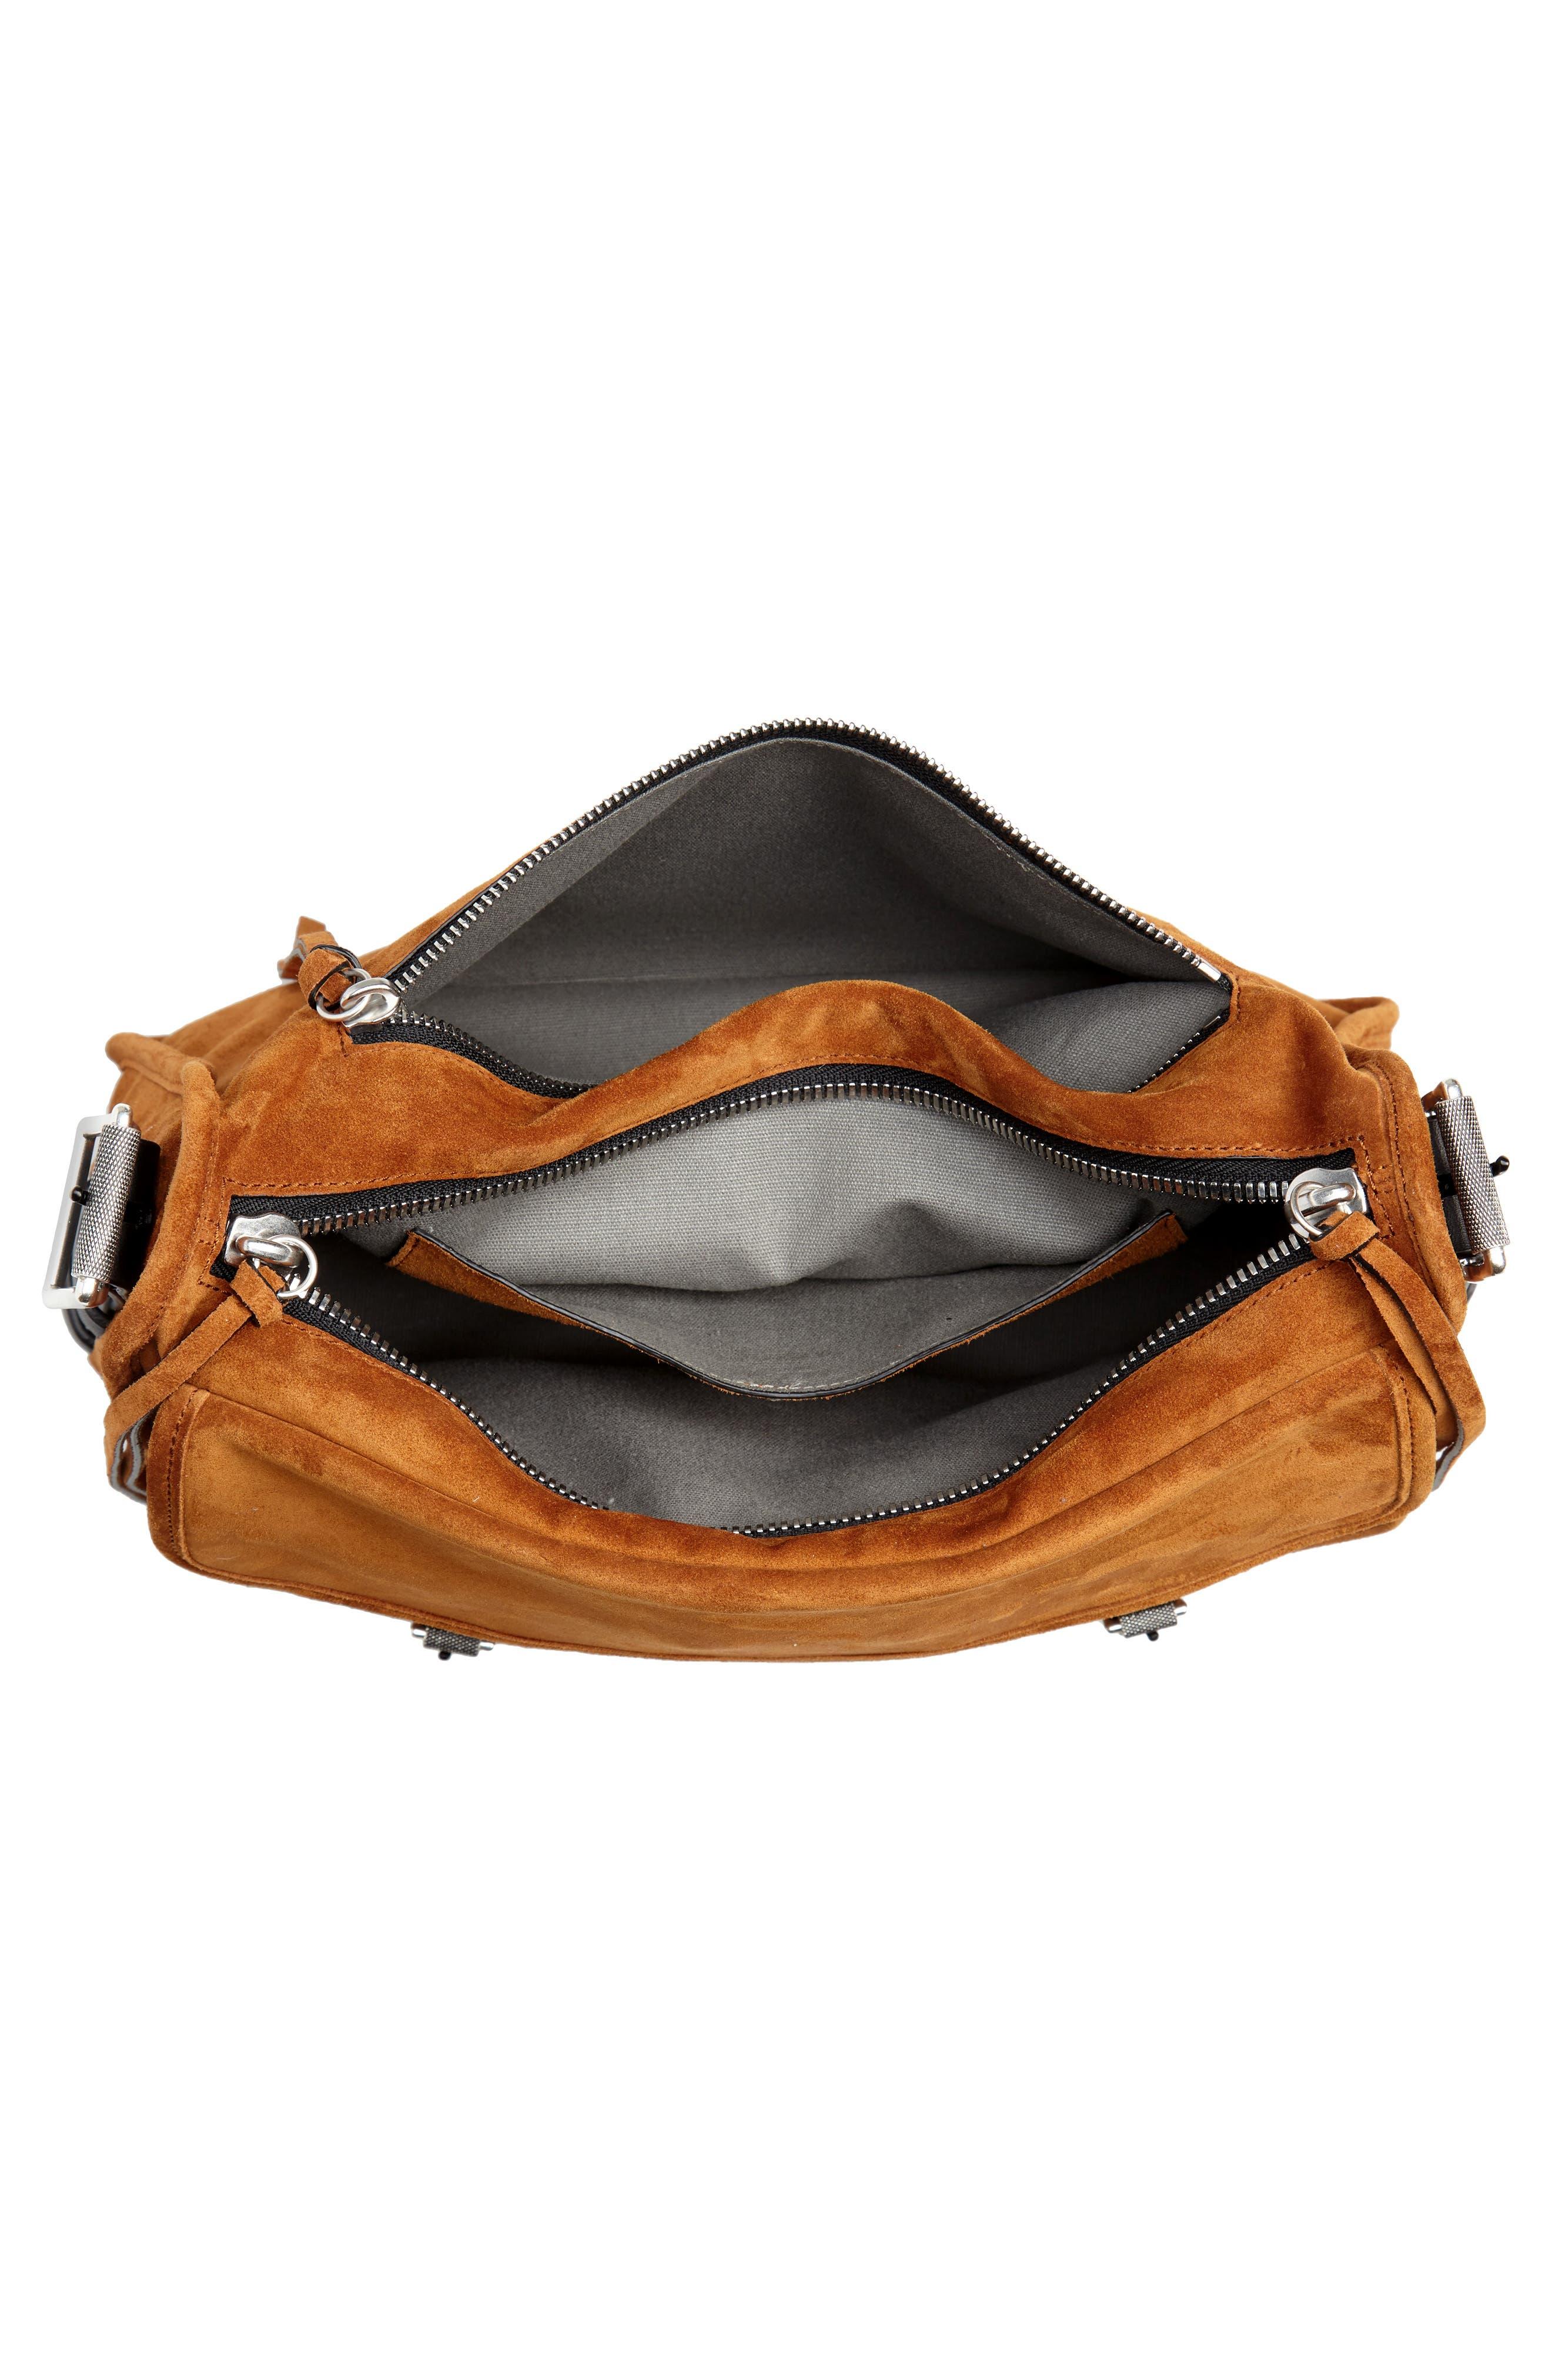 Field Leather Messenger Bag,                             Alternate thumbnail 6, color,                             Tan Suede